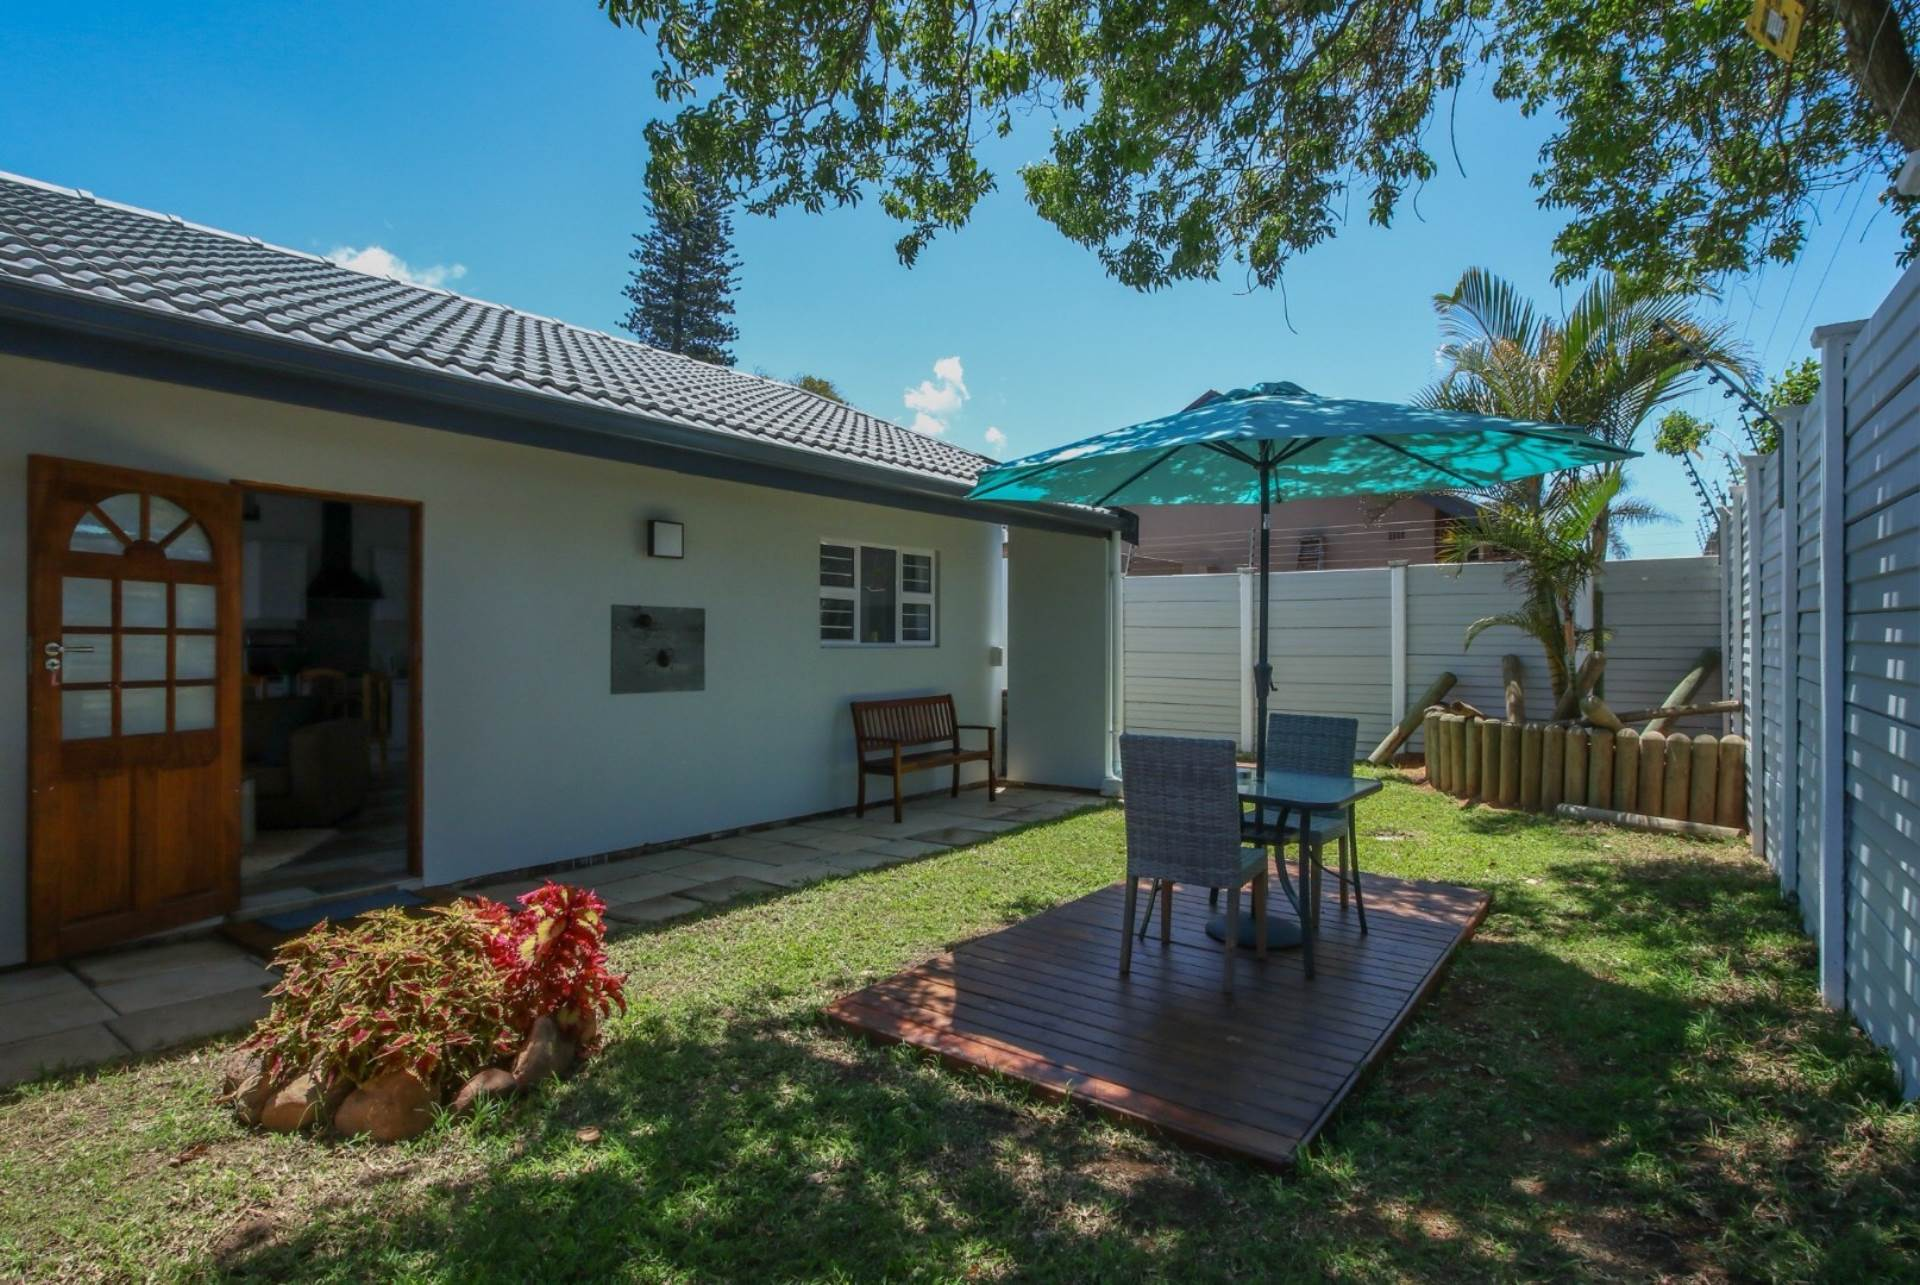 3 BedroomHouse For Sale In Herrwood Park